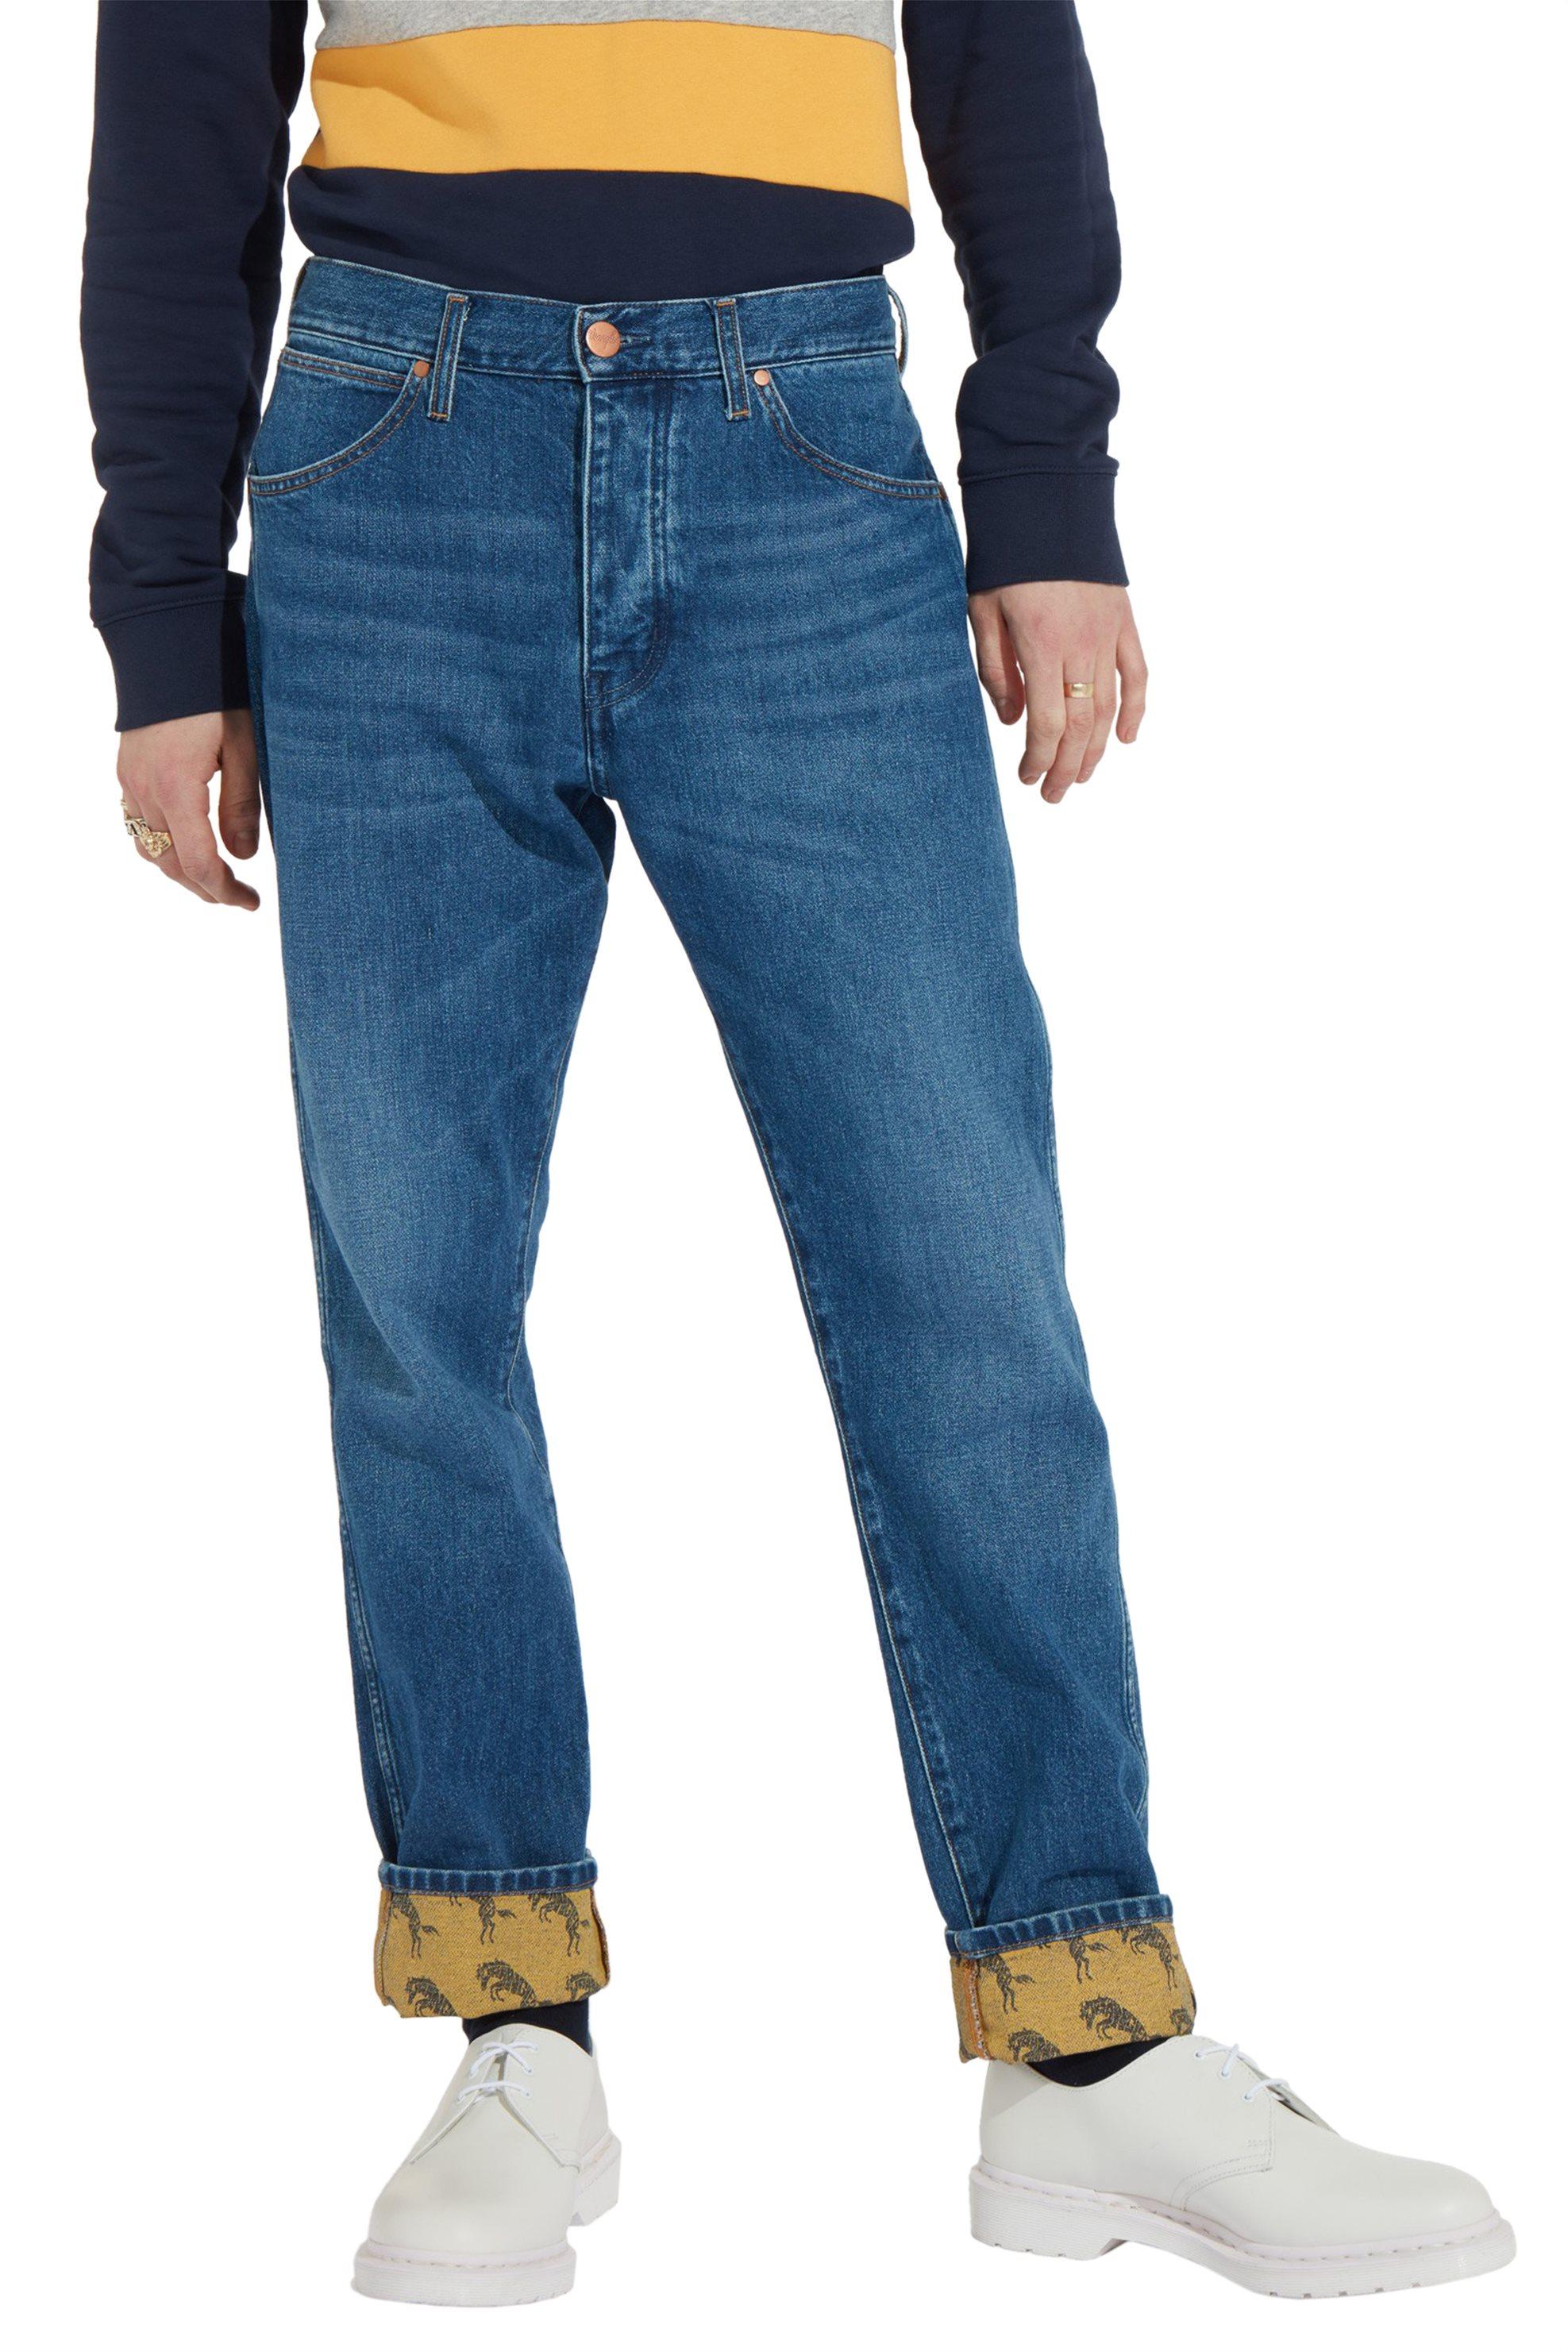 Wrangler ανδρικό παντελόνι Blue & Yellow Regular Tapered - W11GSW23W - Μπλε ανδρασ   ρουχα   jeans   tapered